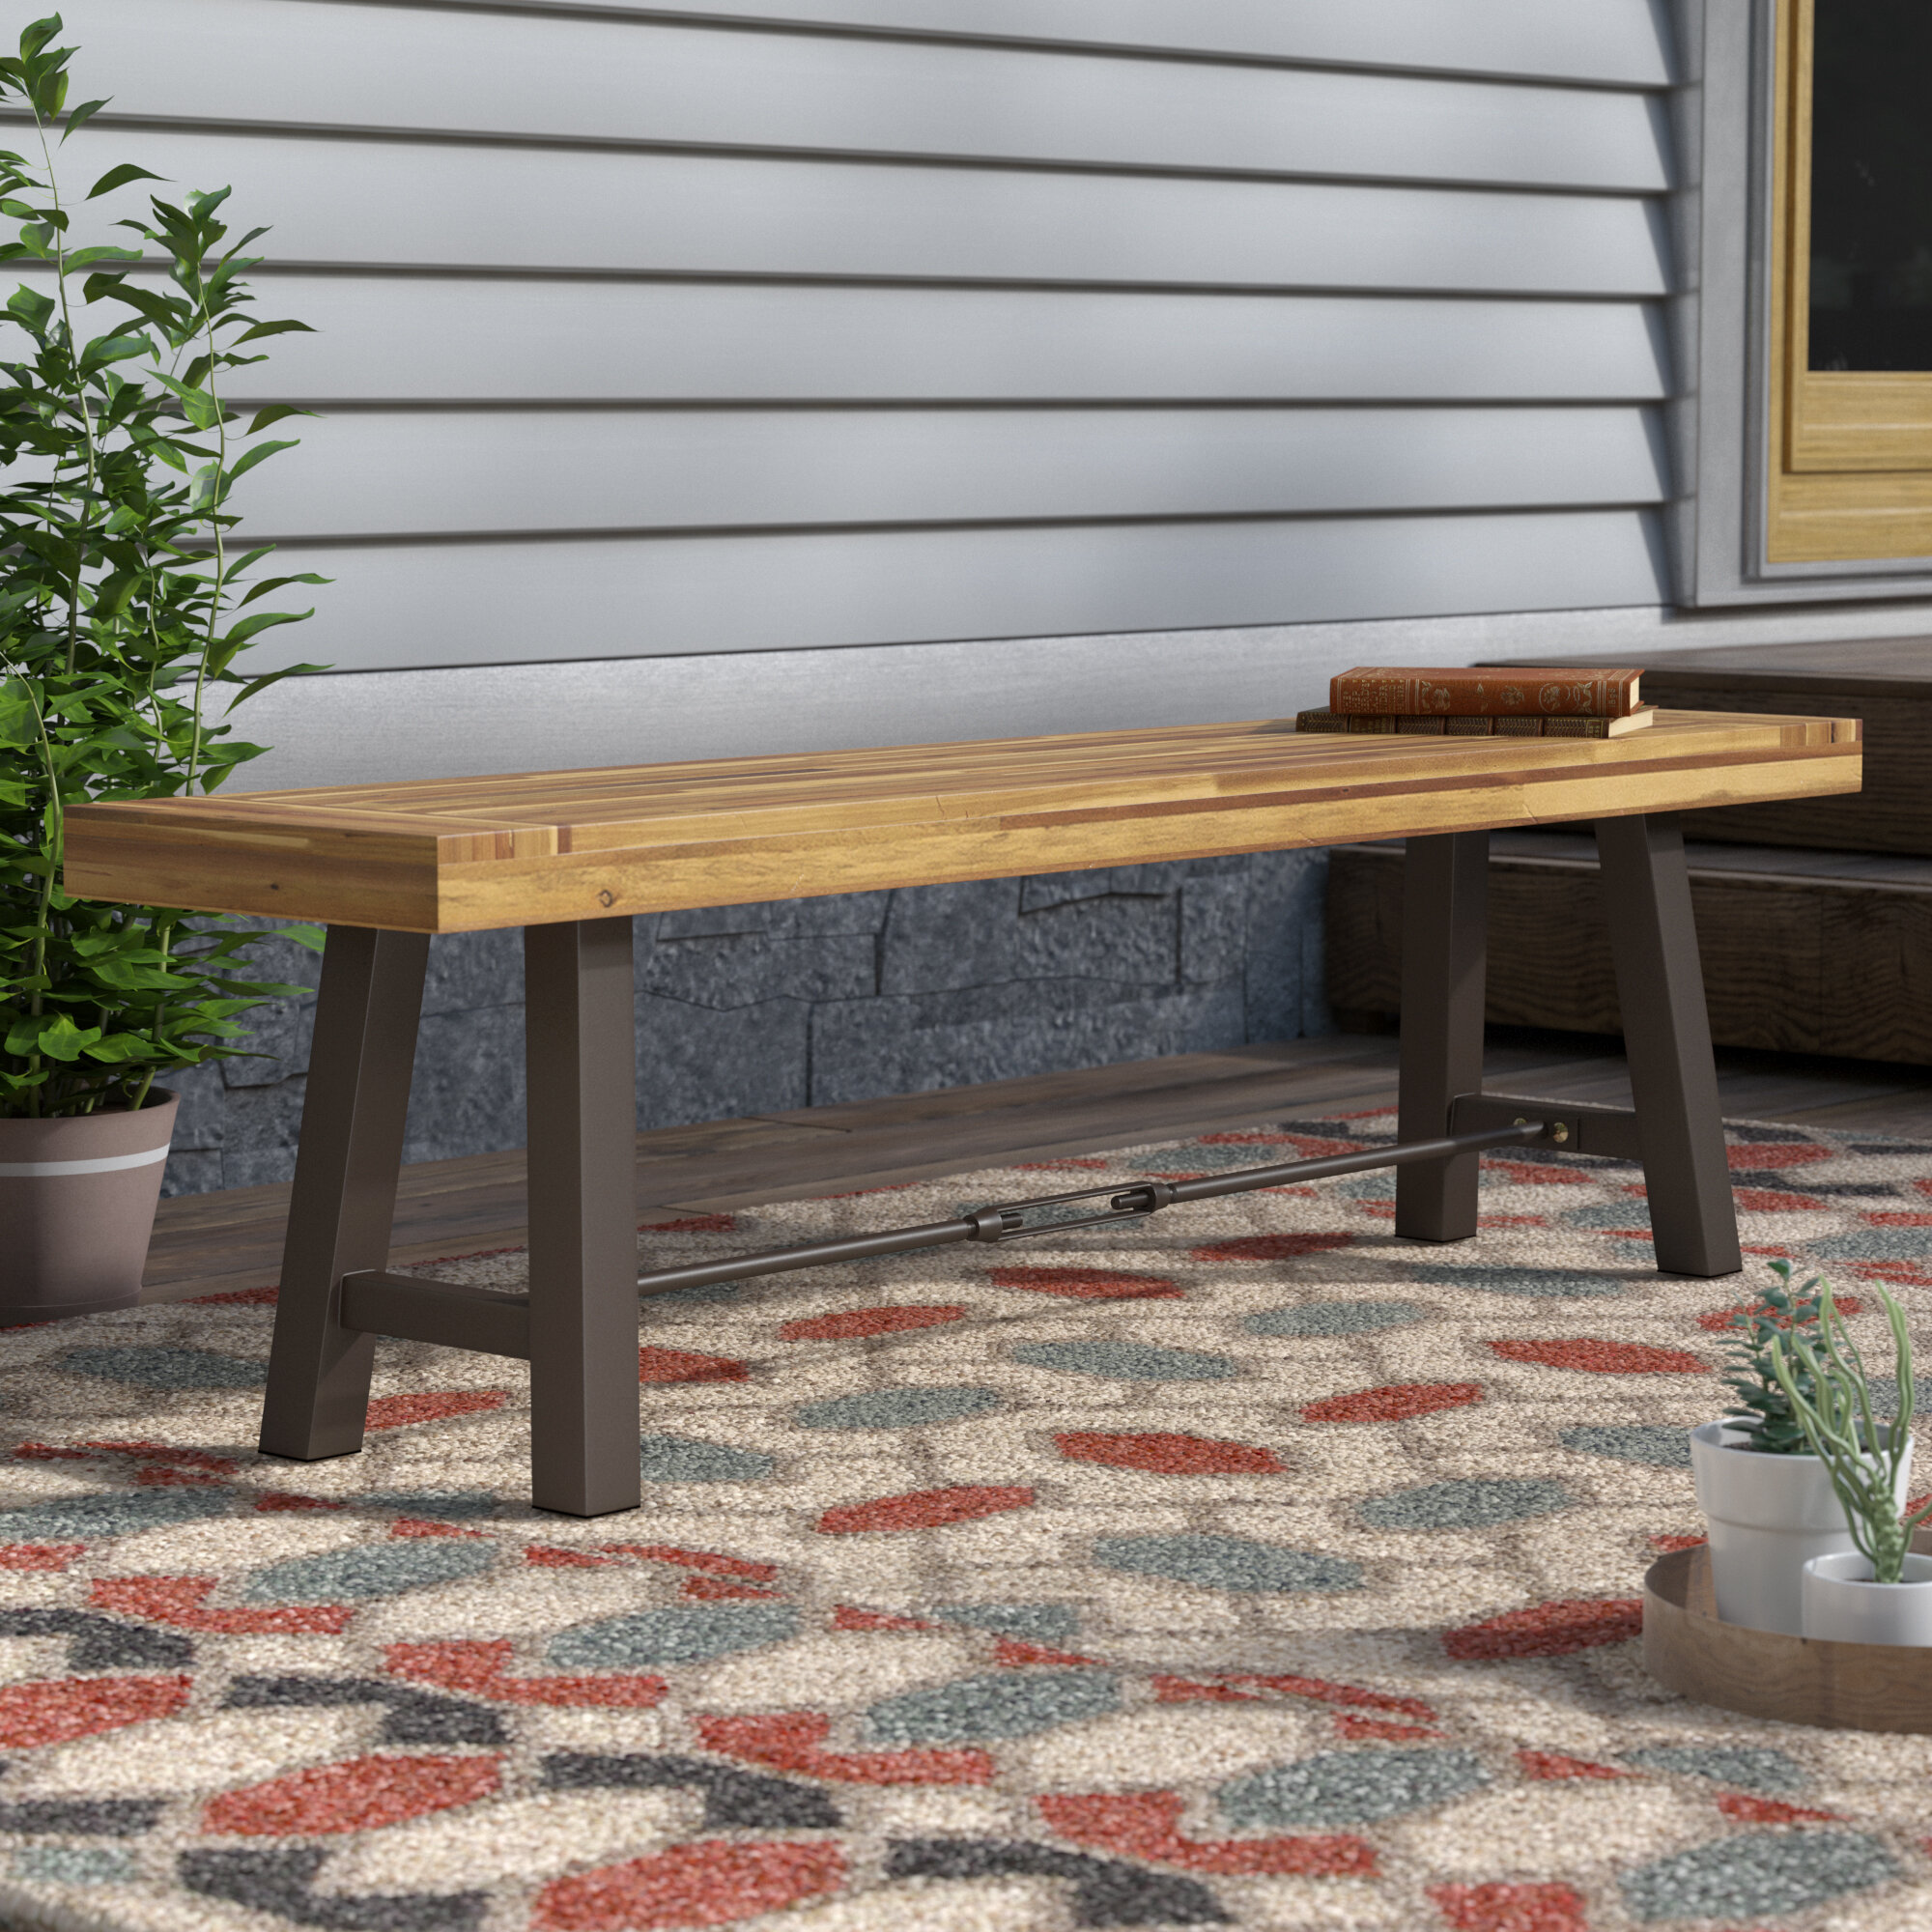 Awe Inspiring Testwuide Outdoor Teak Picnic Bench Evergreenethics Interior Chair Design Evergreenethicsorg